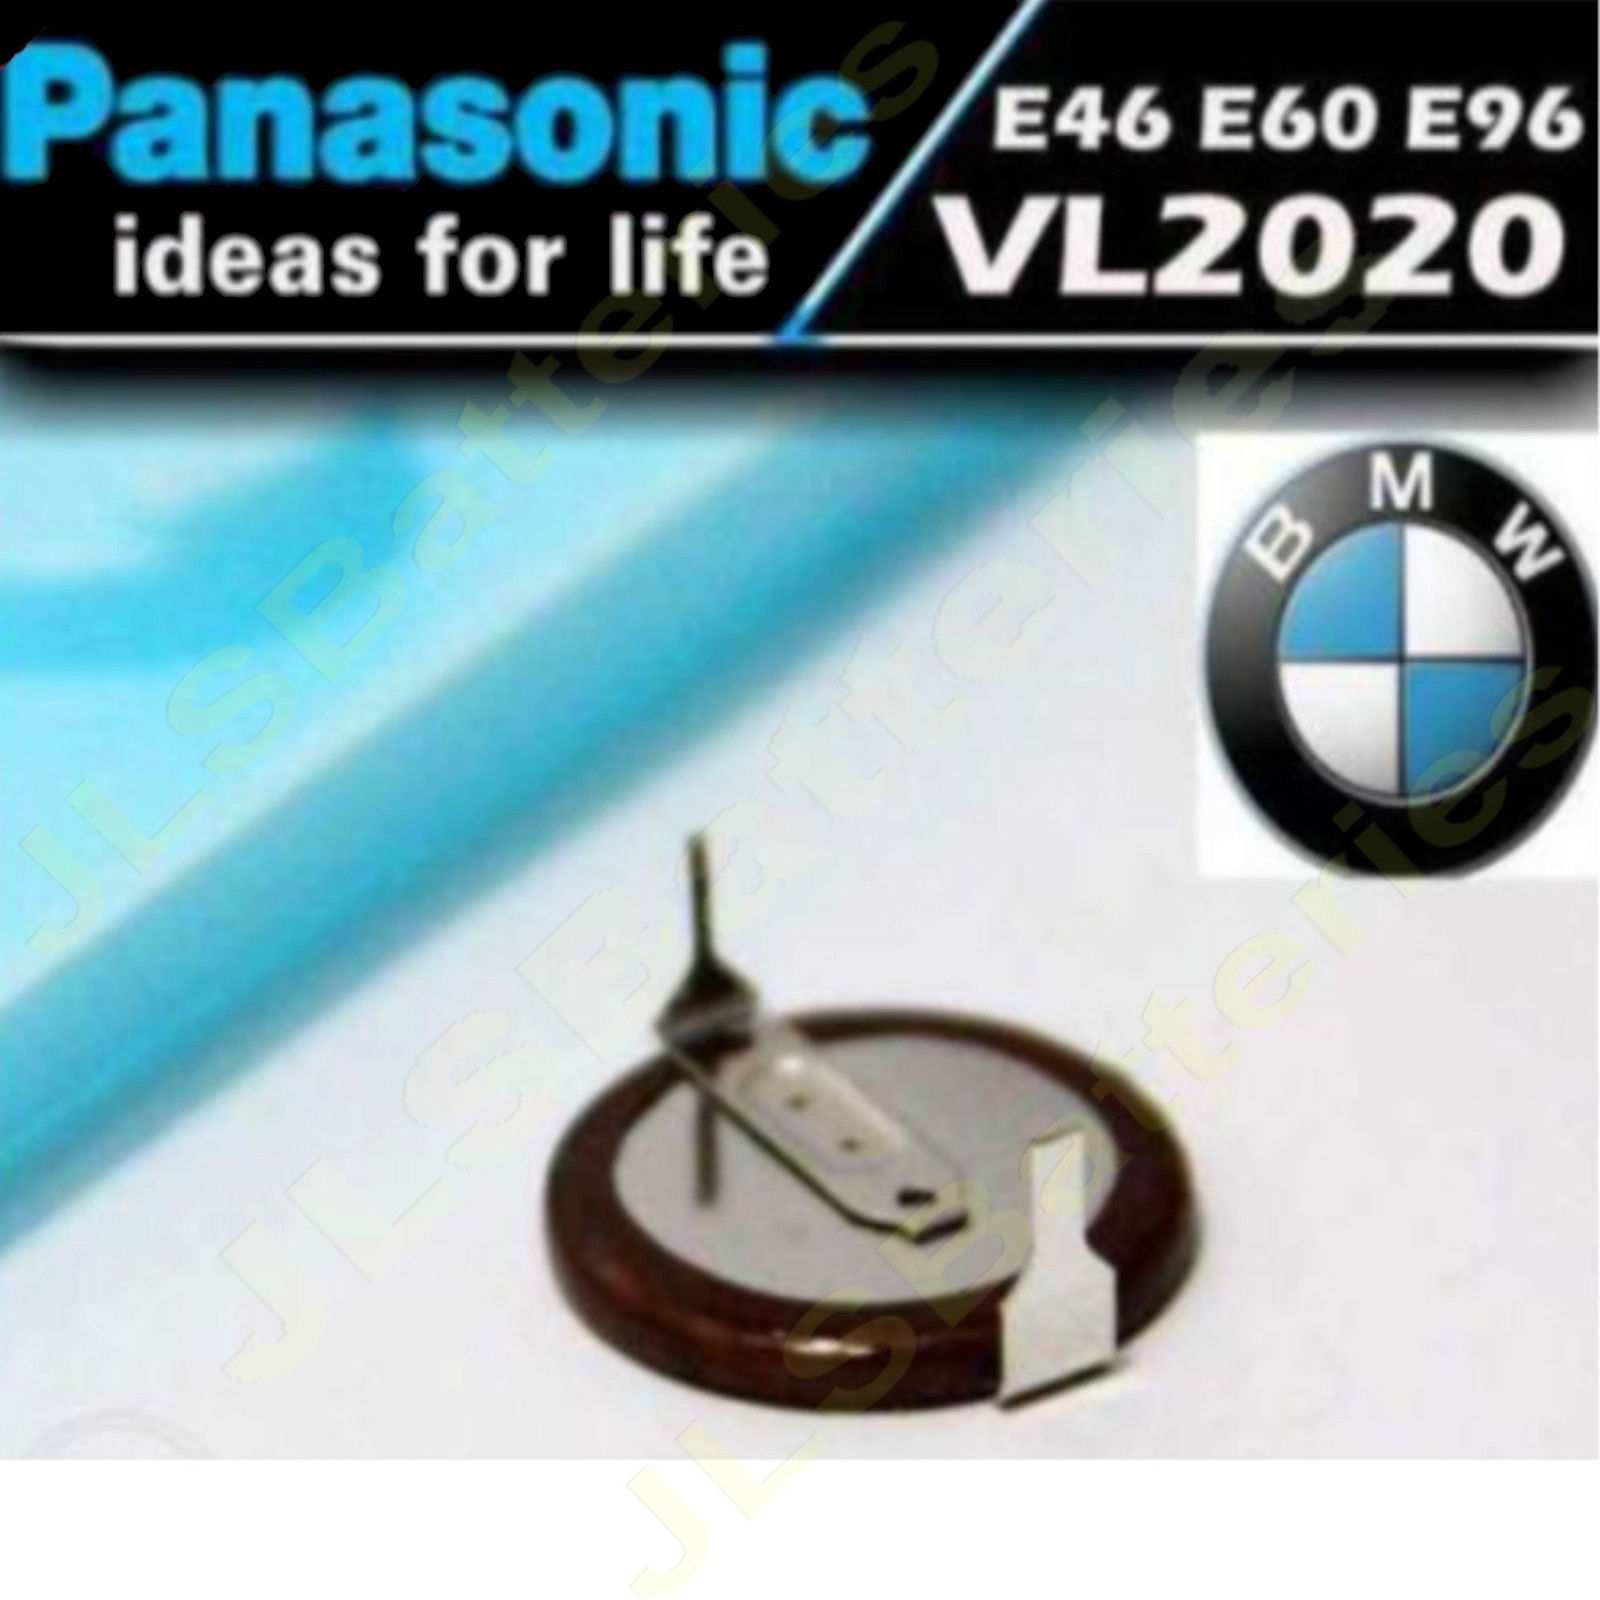 89 Great Panasonic Vl2020 Bmw Key New Review by Panasonic Vl2020 Bmw Key